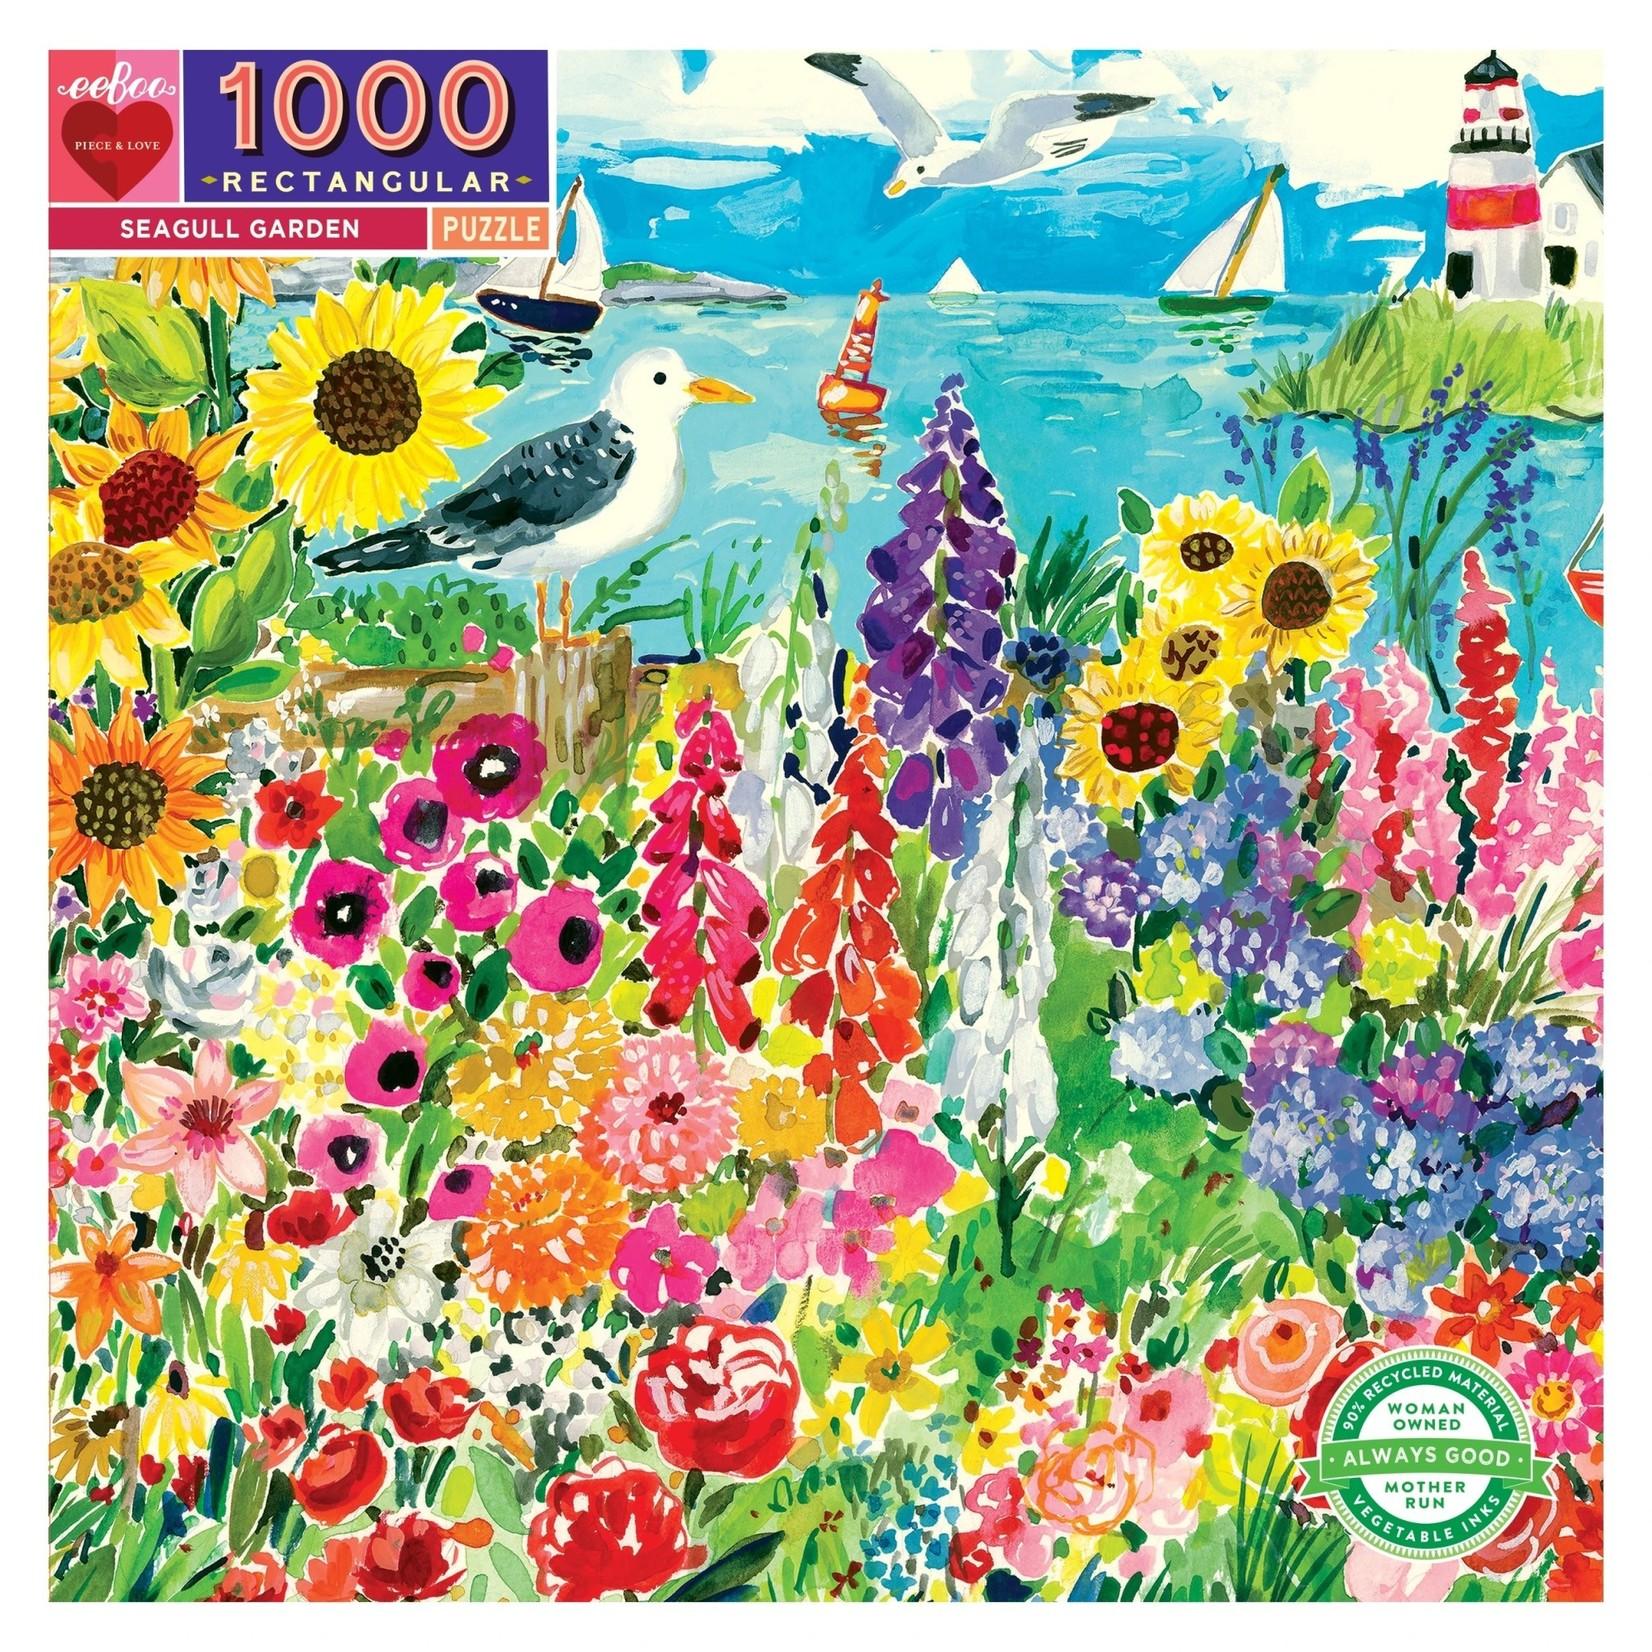 Eeboo Seagull Garden - 1000 Piece Jigsaw Puzzle